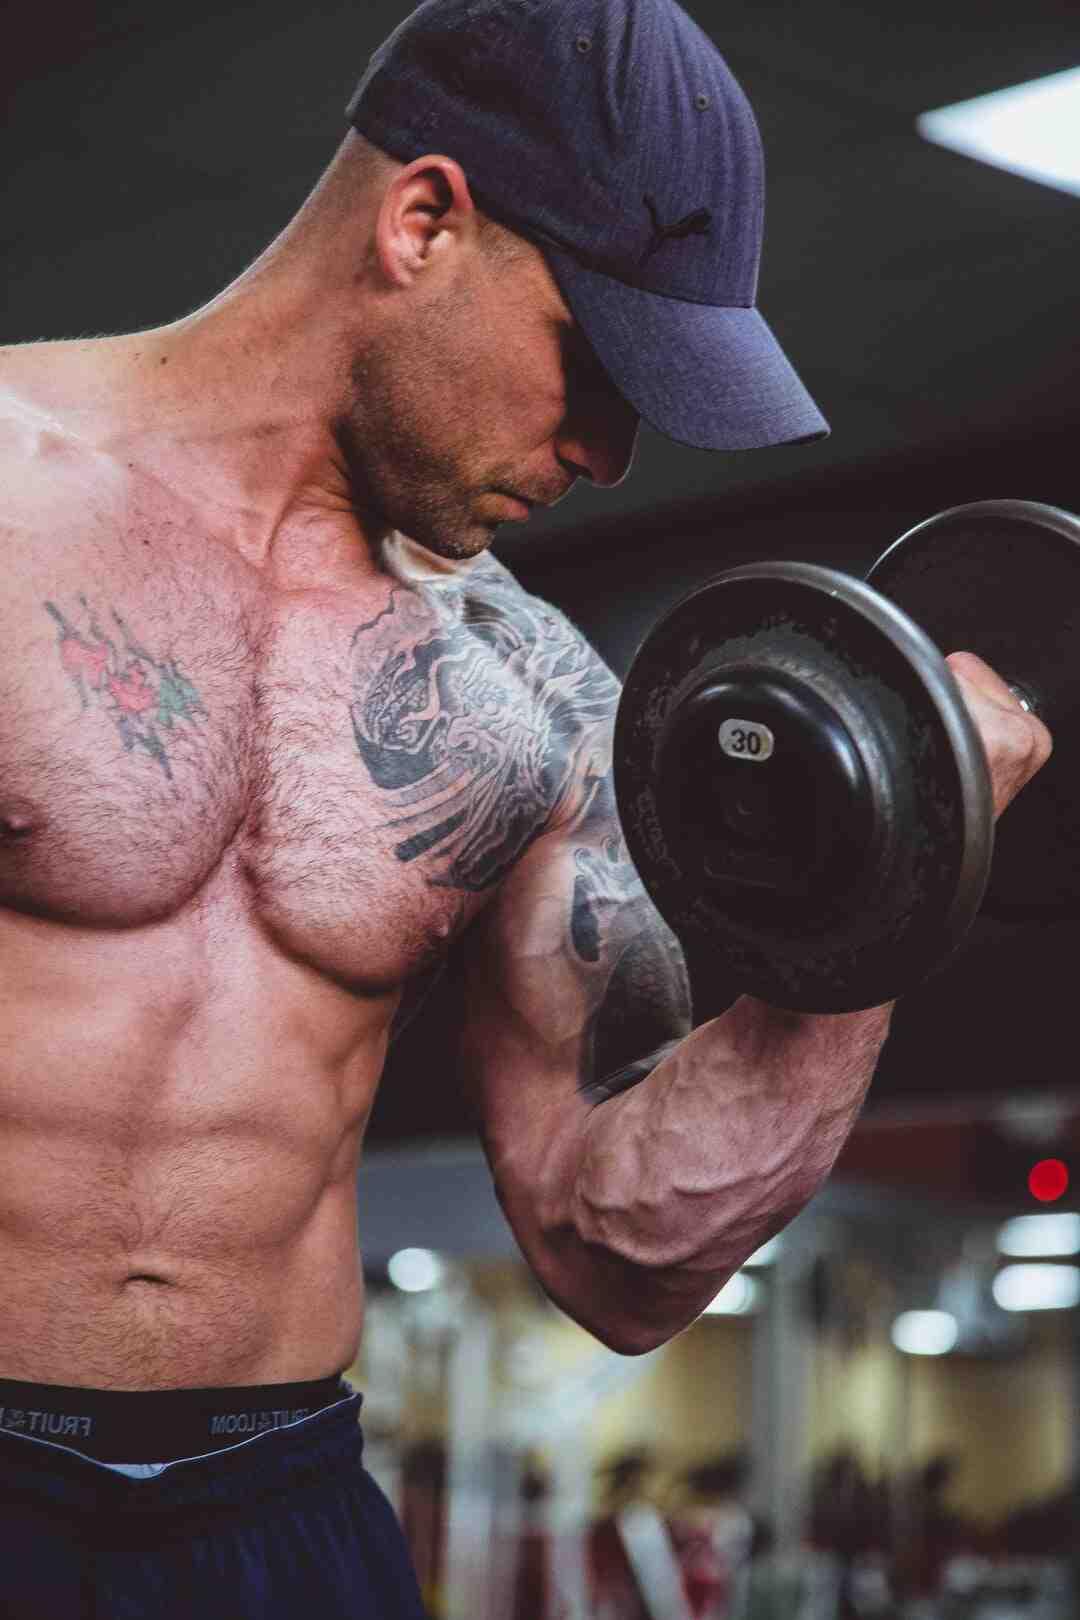 Quel exercice musculation pour maigrir ?